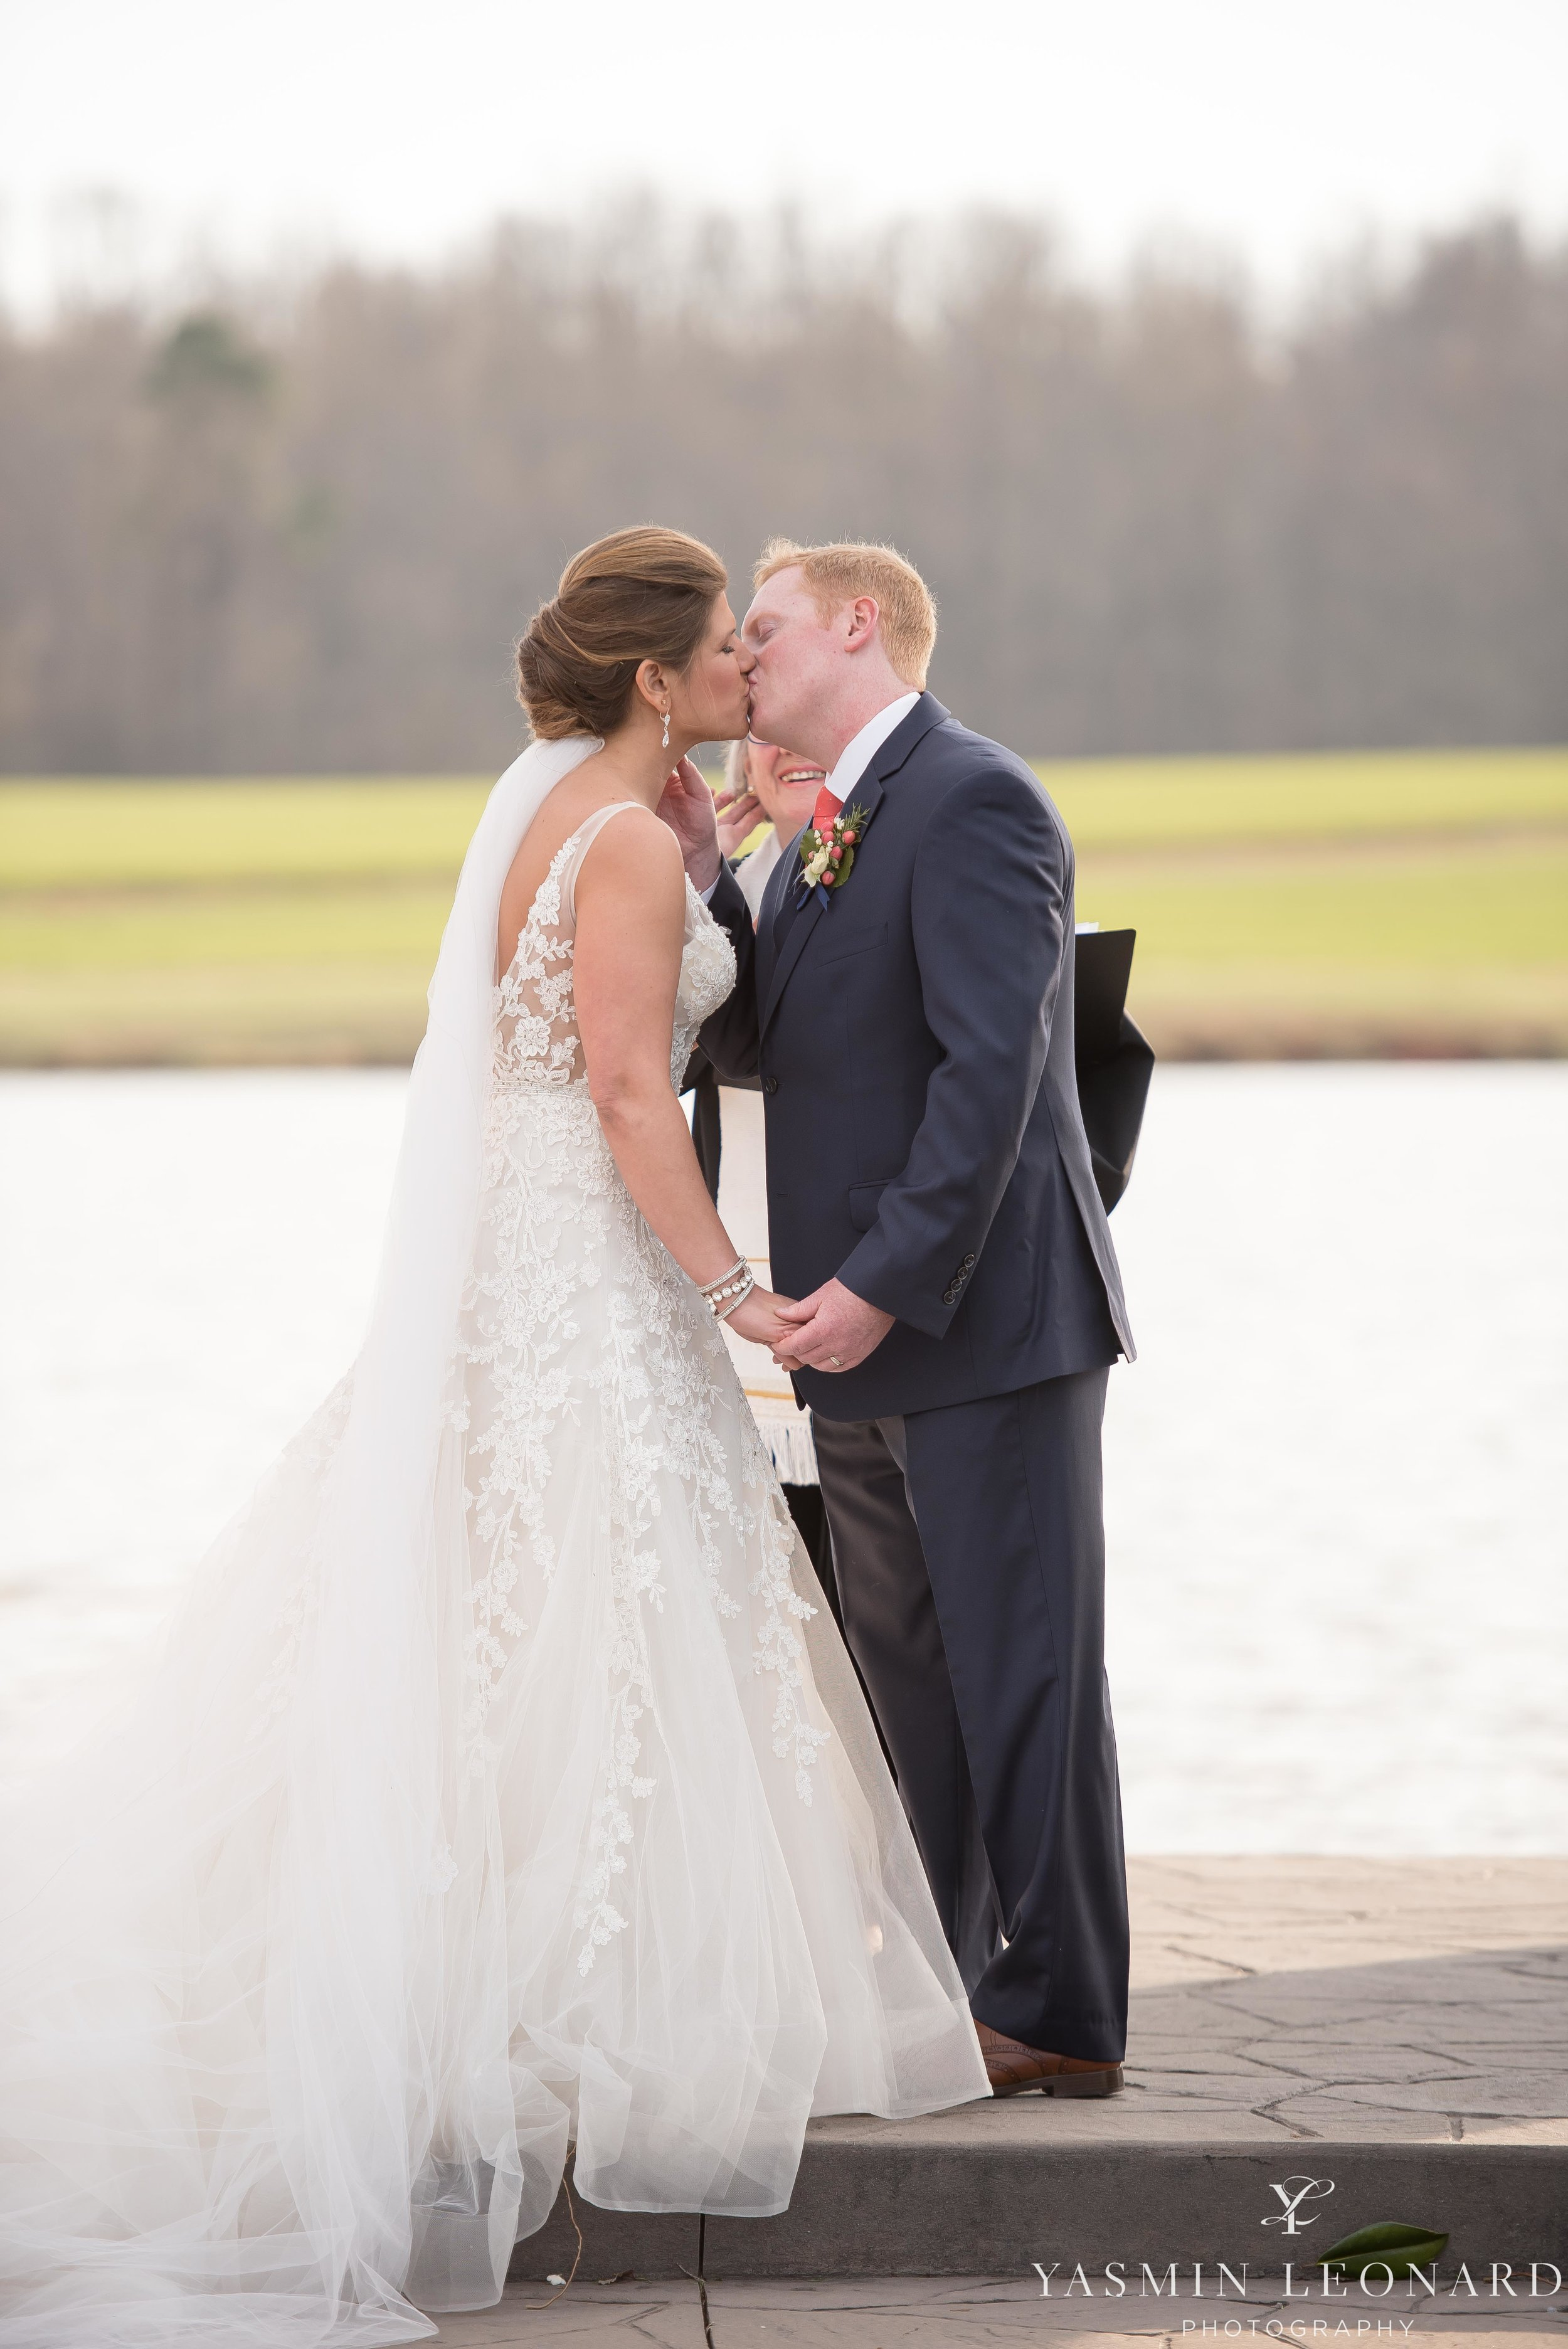 Adaumont Farm - Adaumont Farm Weddings - Trinity Weddings - NC Weddings - Yasmin Leonard Photography-37.jpg